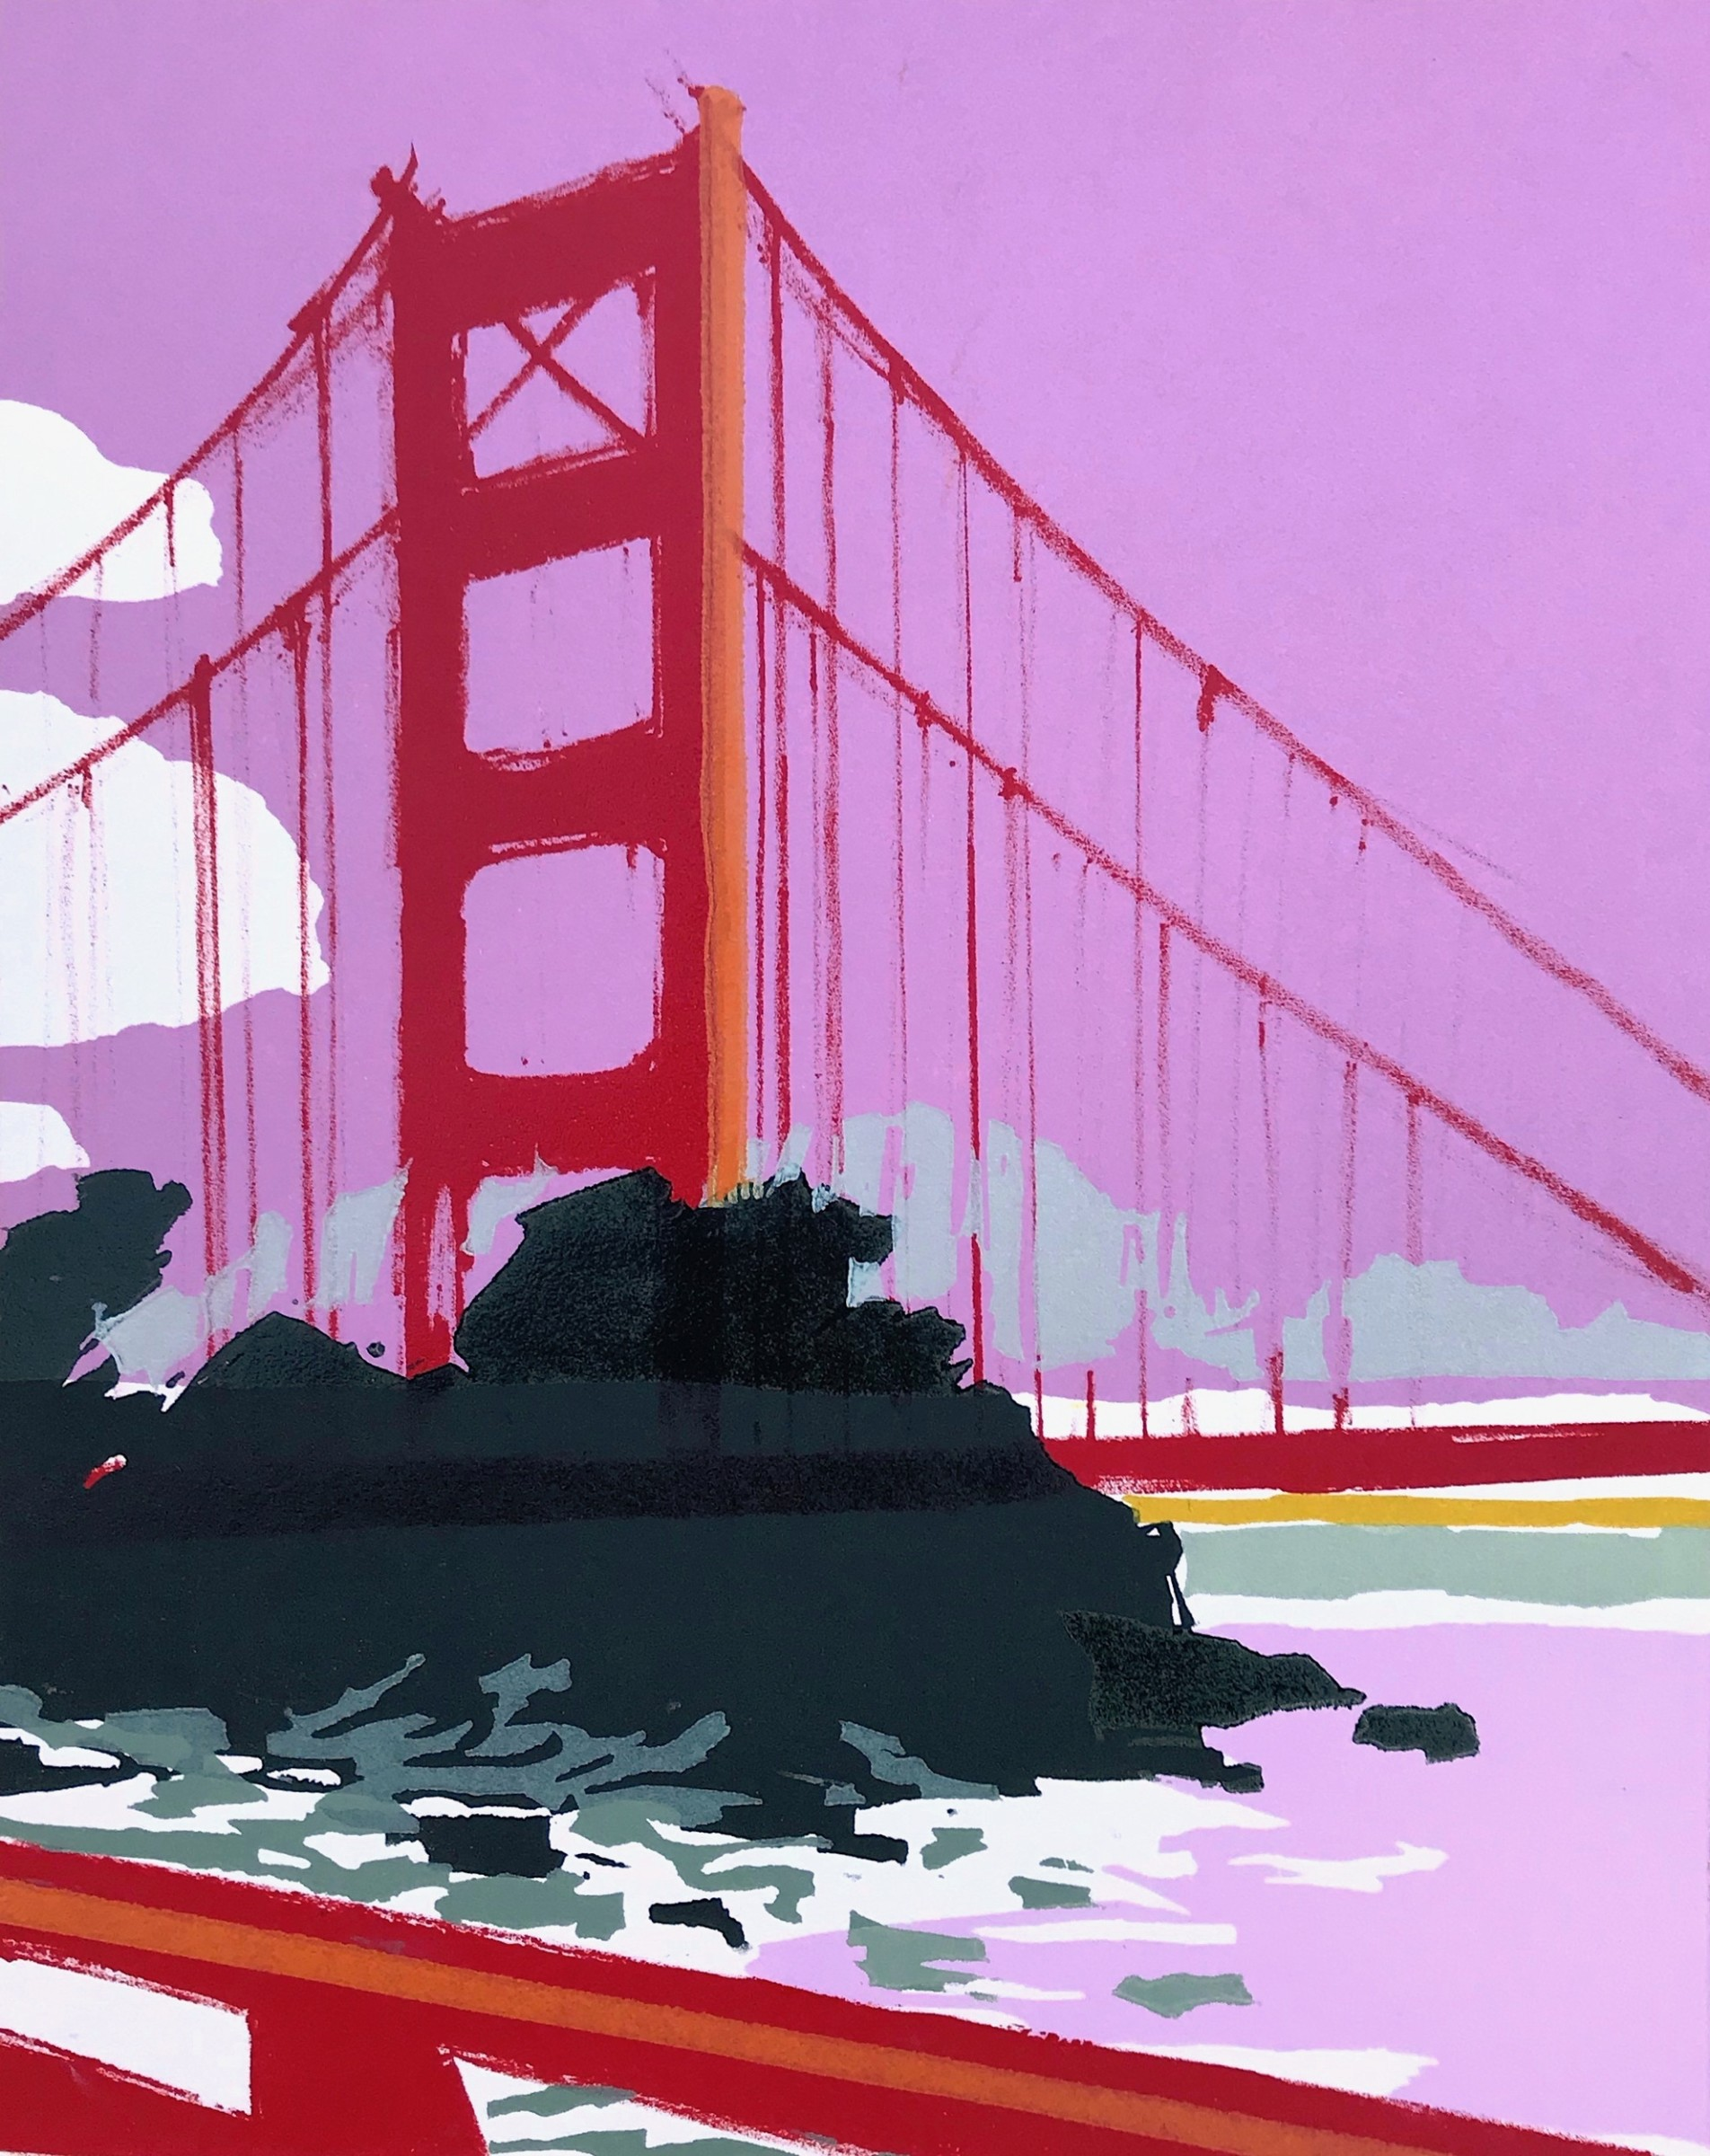 "<span class=""link fancybox-details-link""><a href=""/exhibitions/20/works/artworks_standalone10686/"">View Detail Page</a></span><div class=""artist""><span class=""artist""><strong>Rachel Gracey RE</strong></span></div><div class=""title""><em>Golden Gate, San Francisco</em></div><div class=""medium"">lithograph and relief printing</div><div class=""dimensions"">22.5 x 28 cm image size<br></div><div class=""edition_details"">edition of 12</div>"